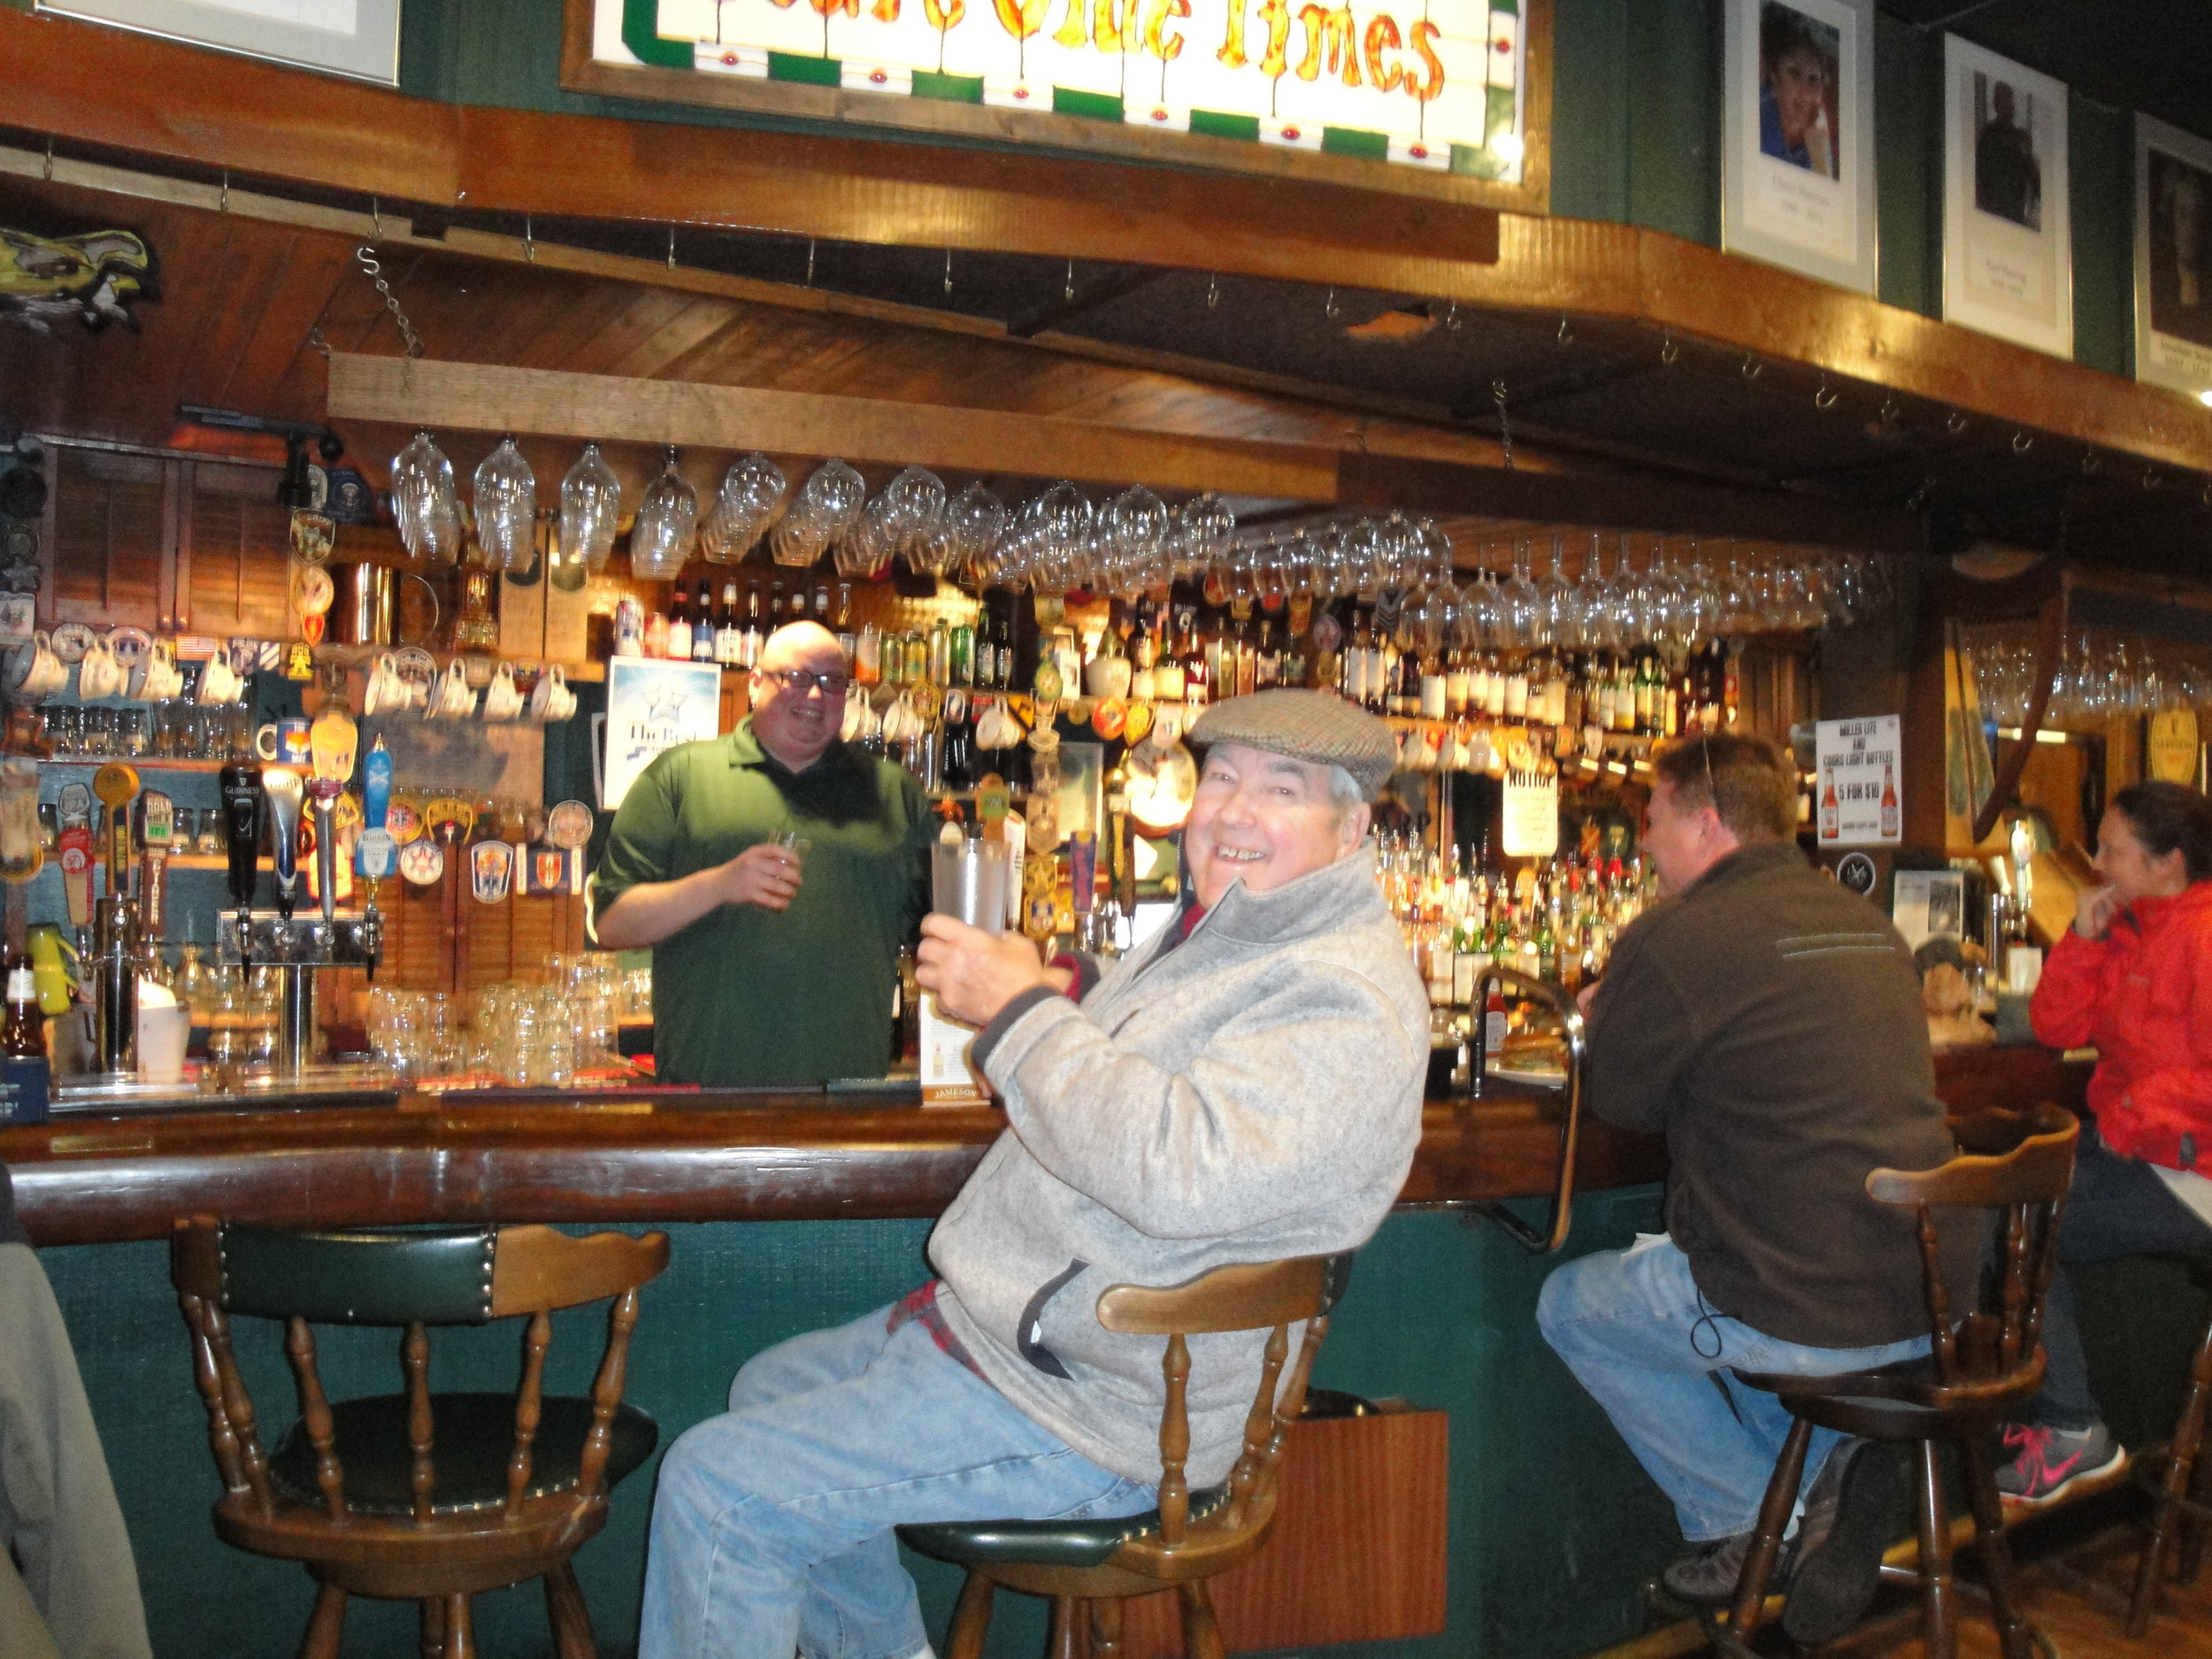 Jim Worsham enjoying a Bourbon and ginger at Rare Olde Times in Richmond, VA.JPG